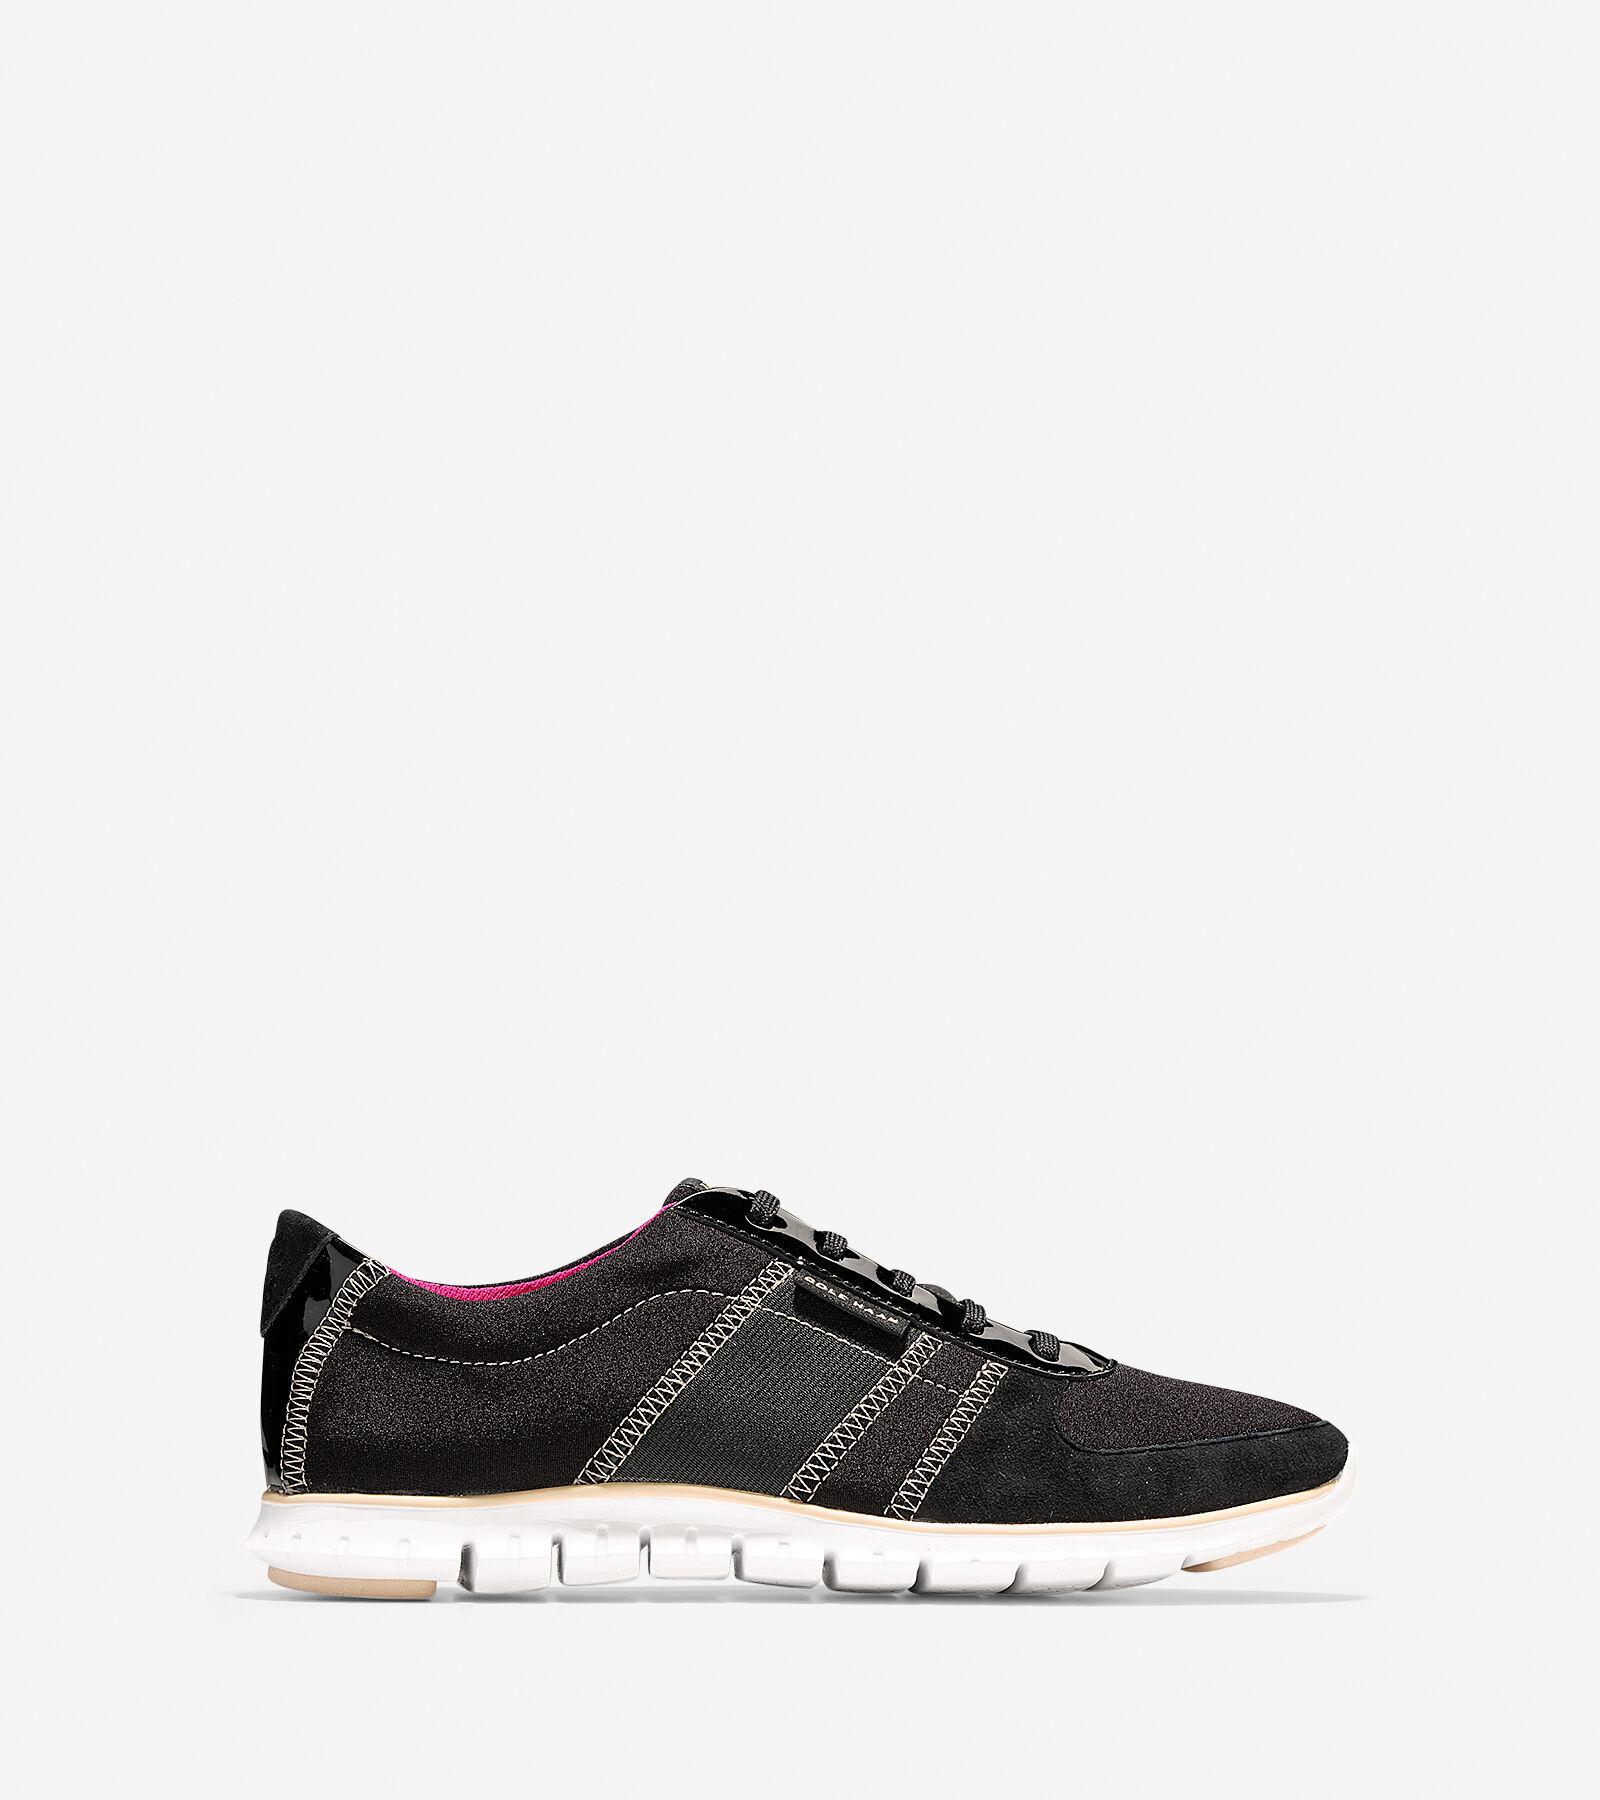 Womens Shoes Cole Haan Zerogrand Sneaker Black/Black Shimmer